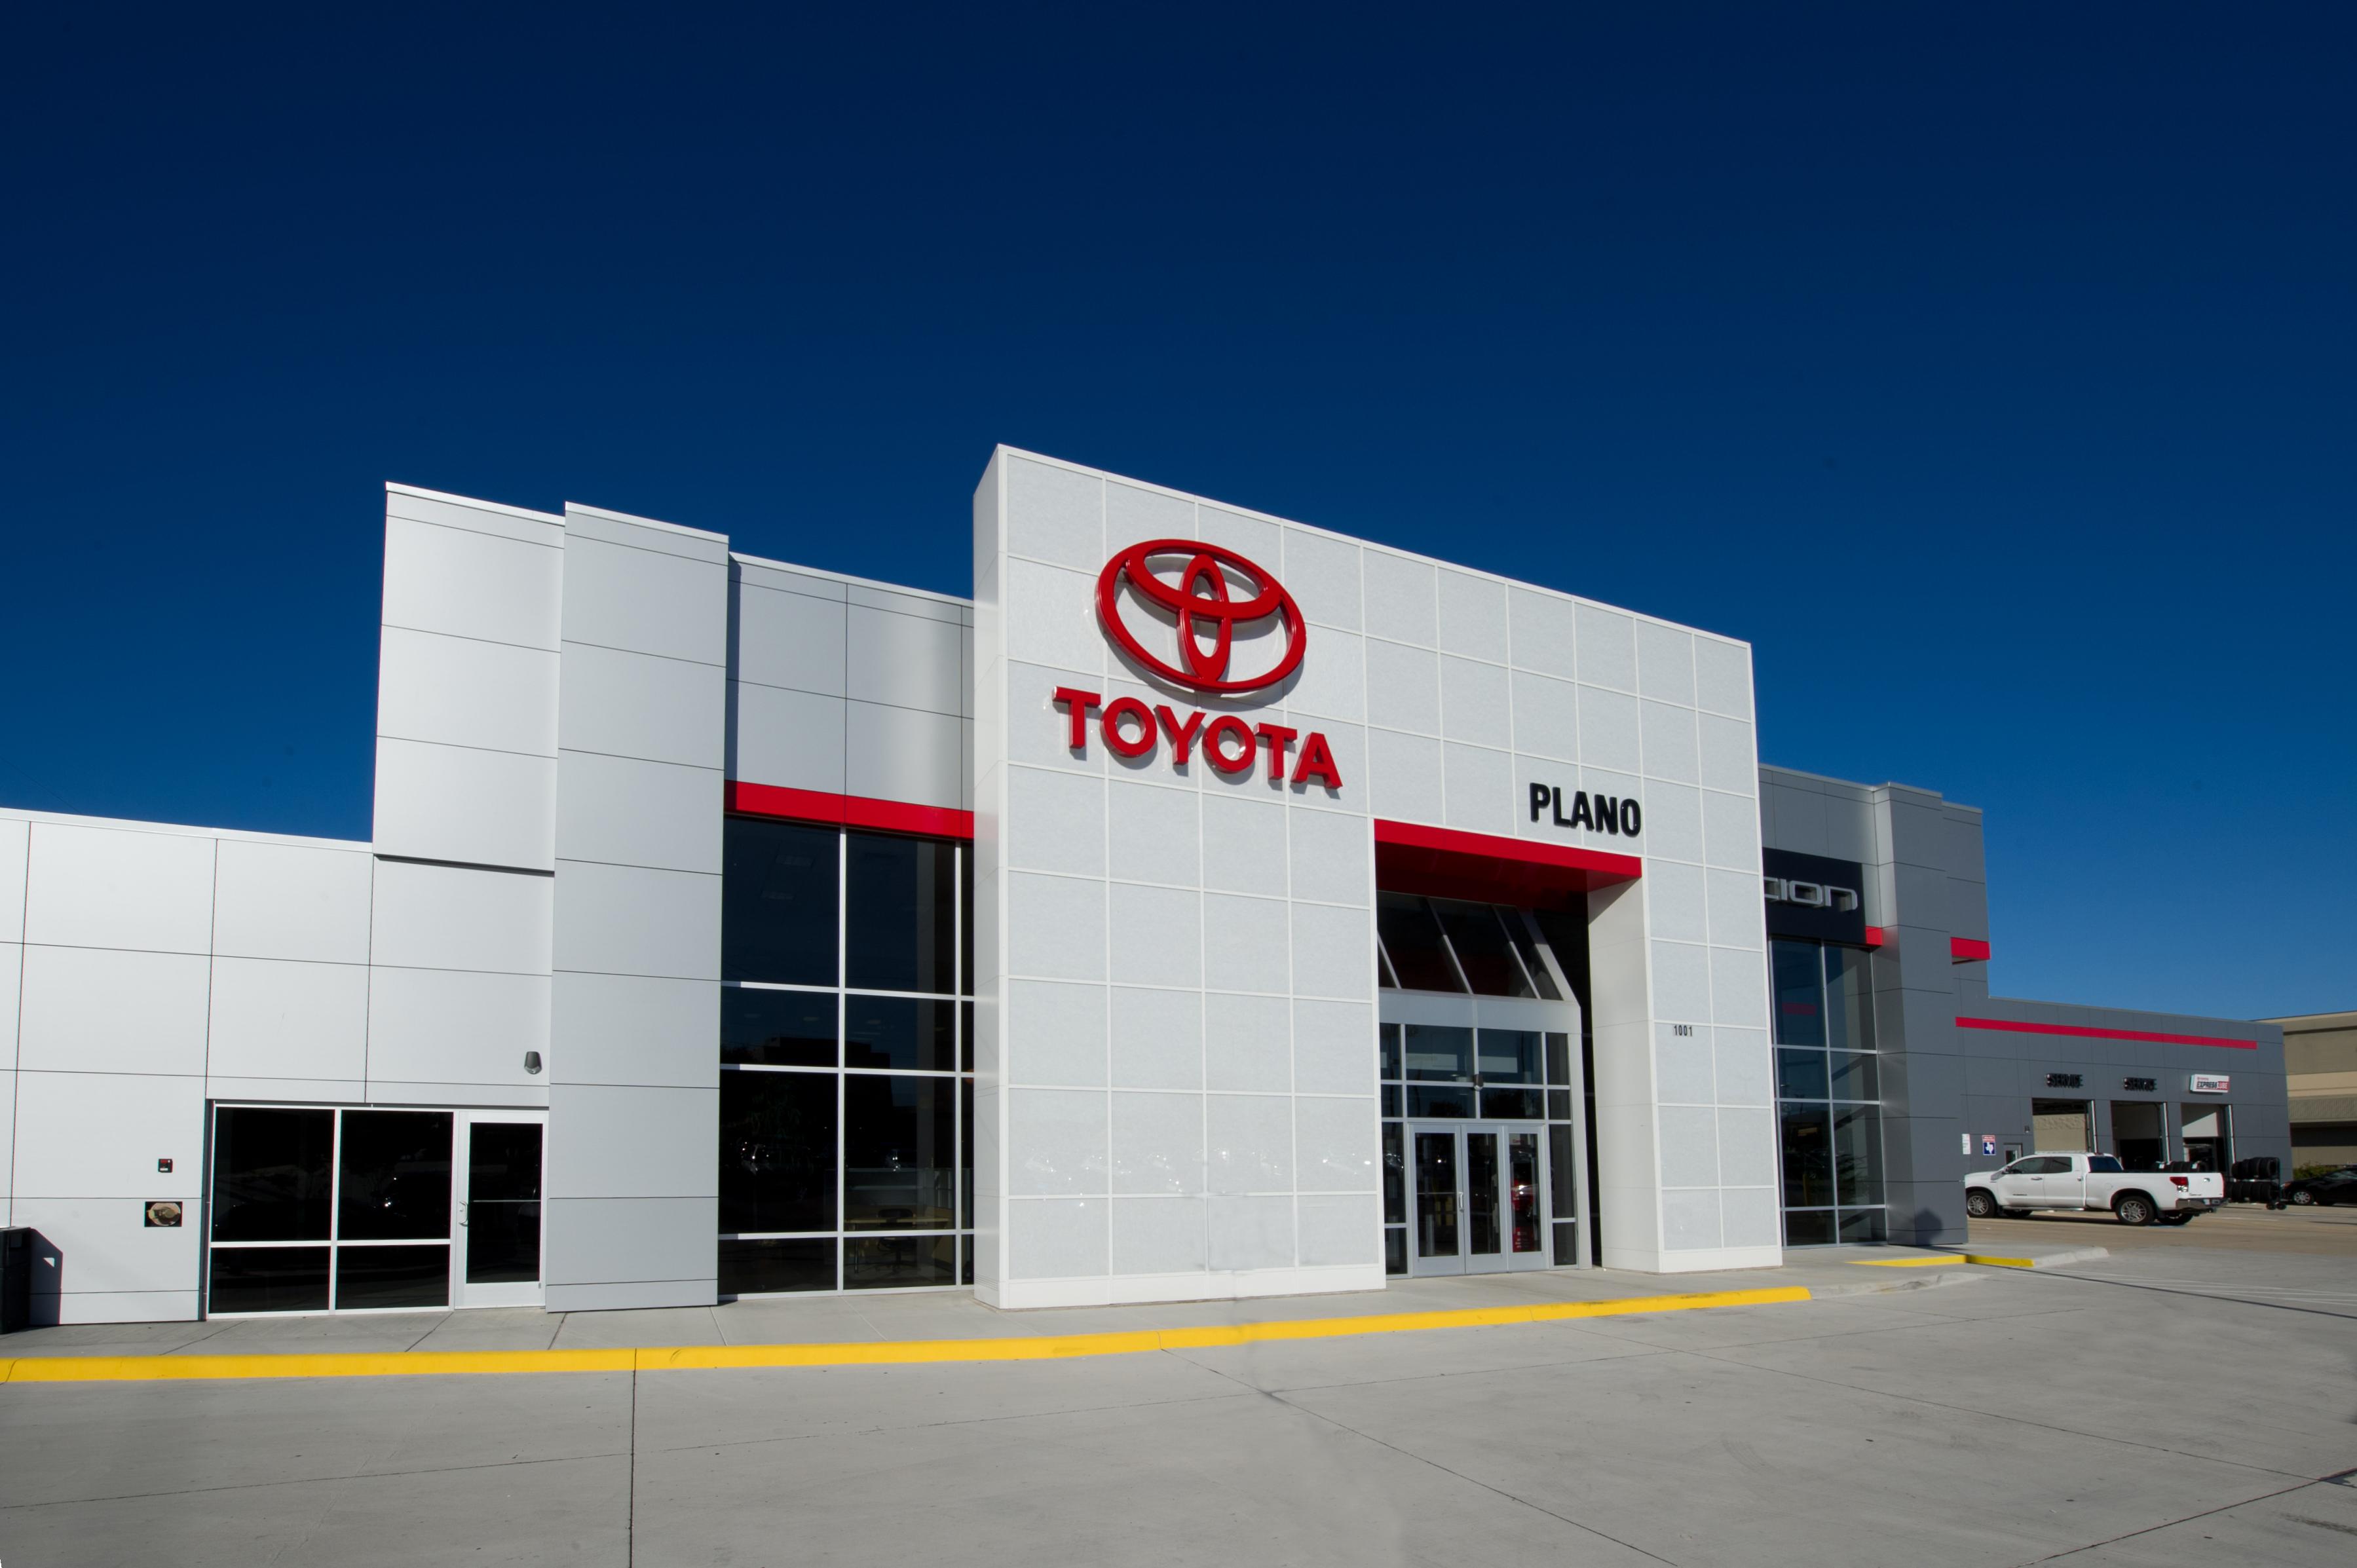 Toyota Of Plano >> Toyota Of Plano 1001 Preston Rd Plano Tx 75093 Yp Com